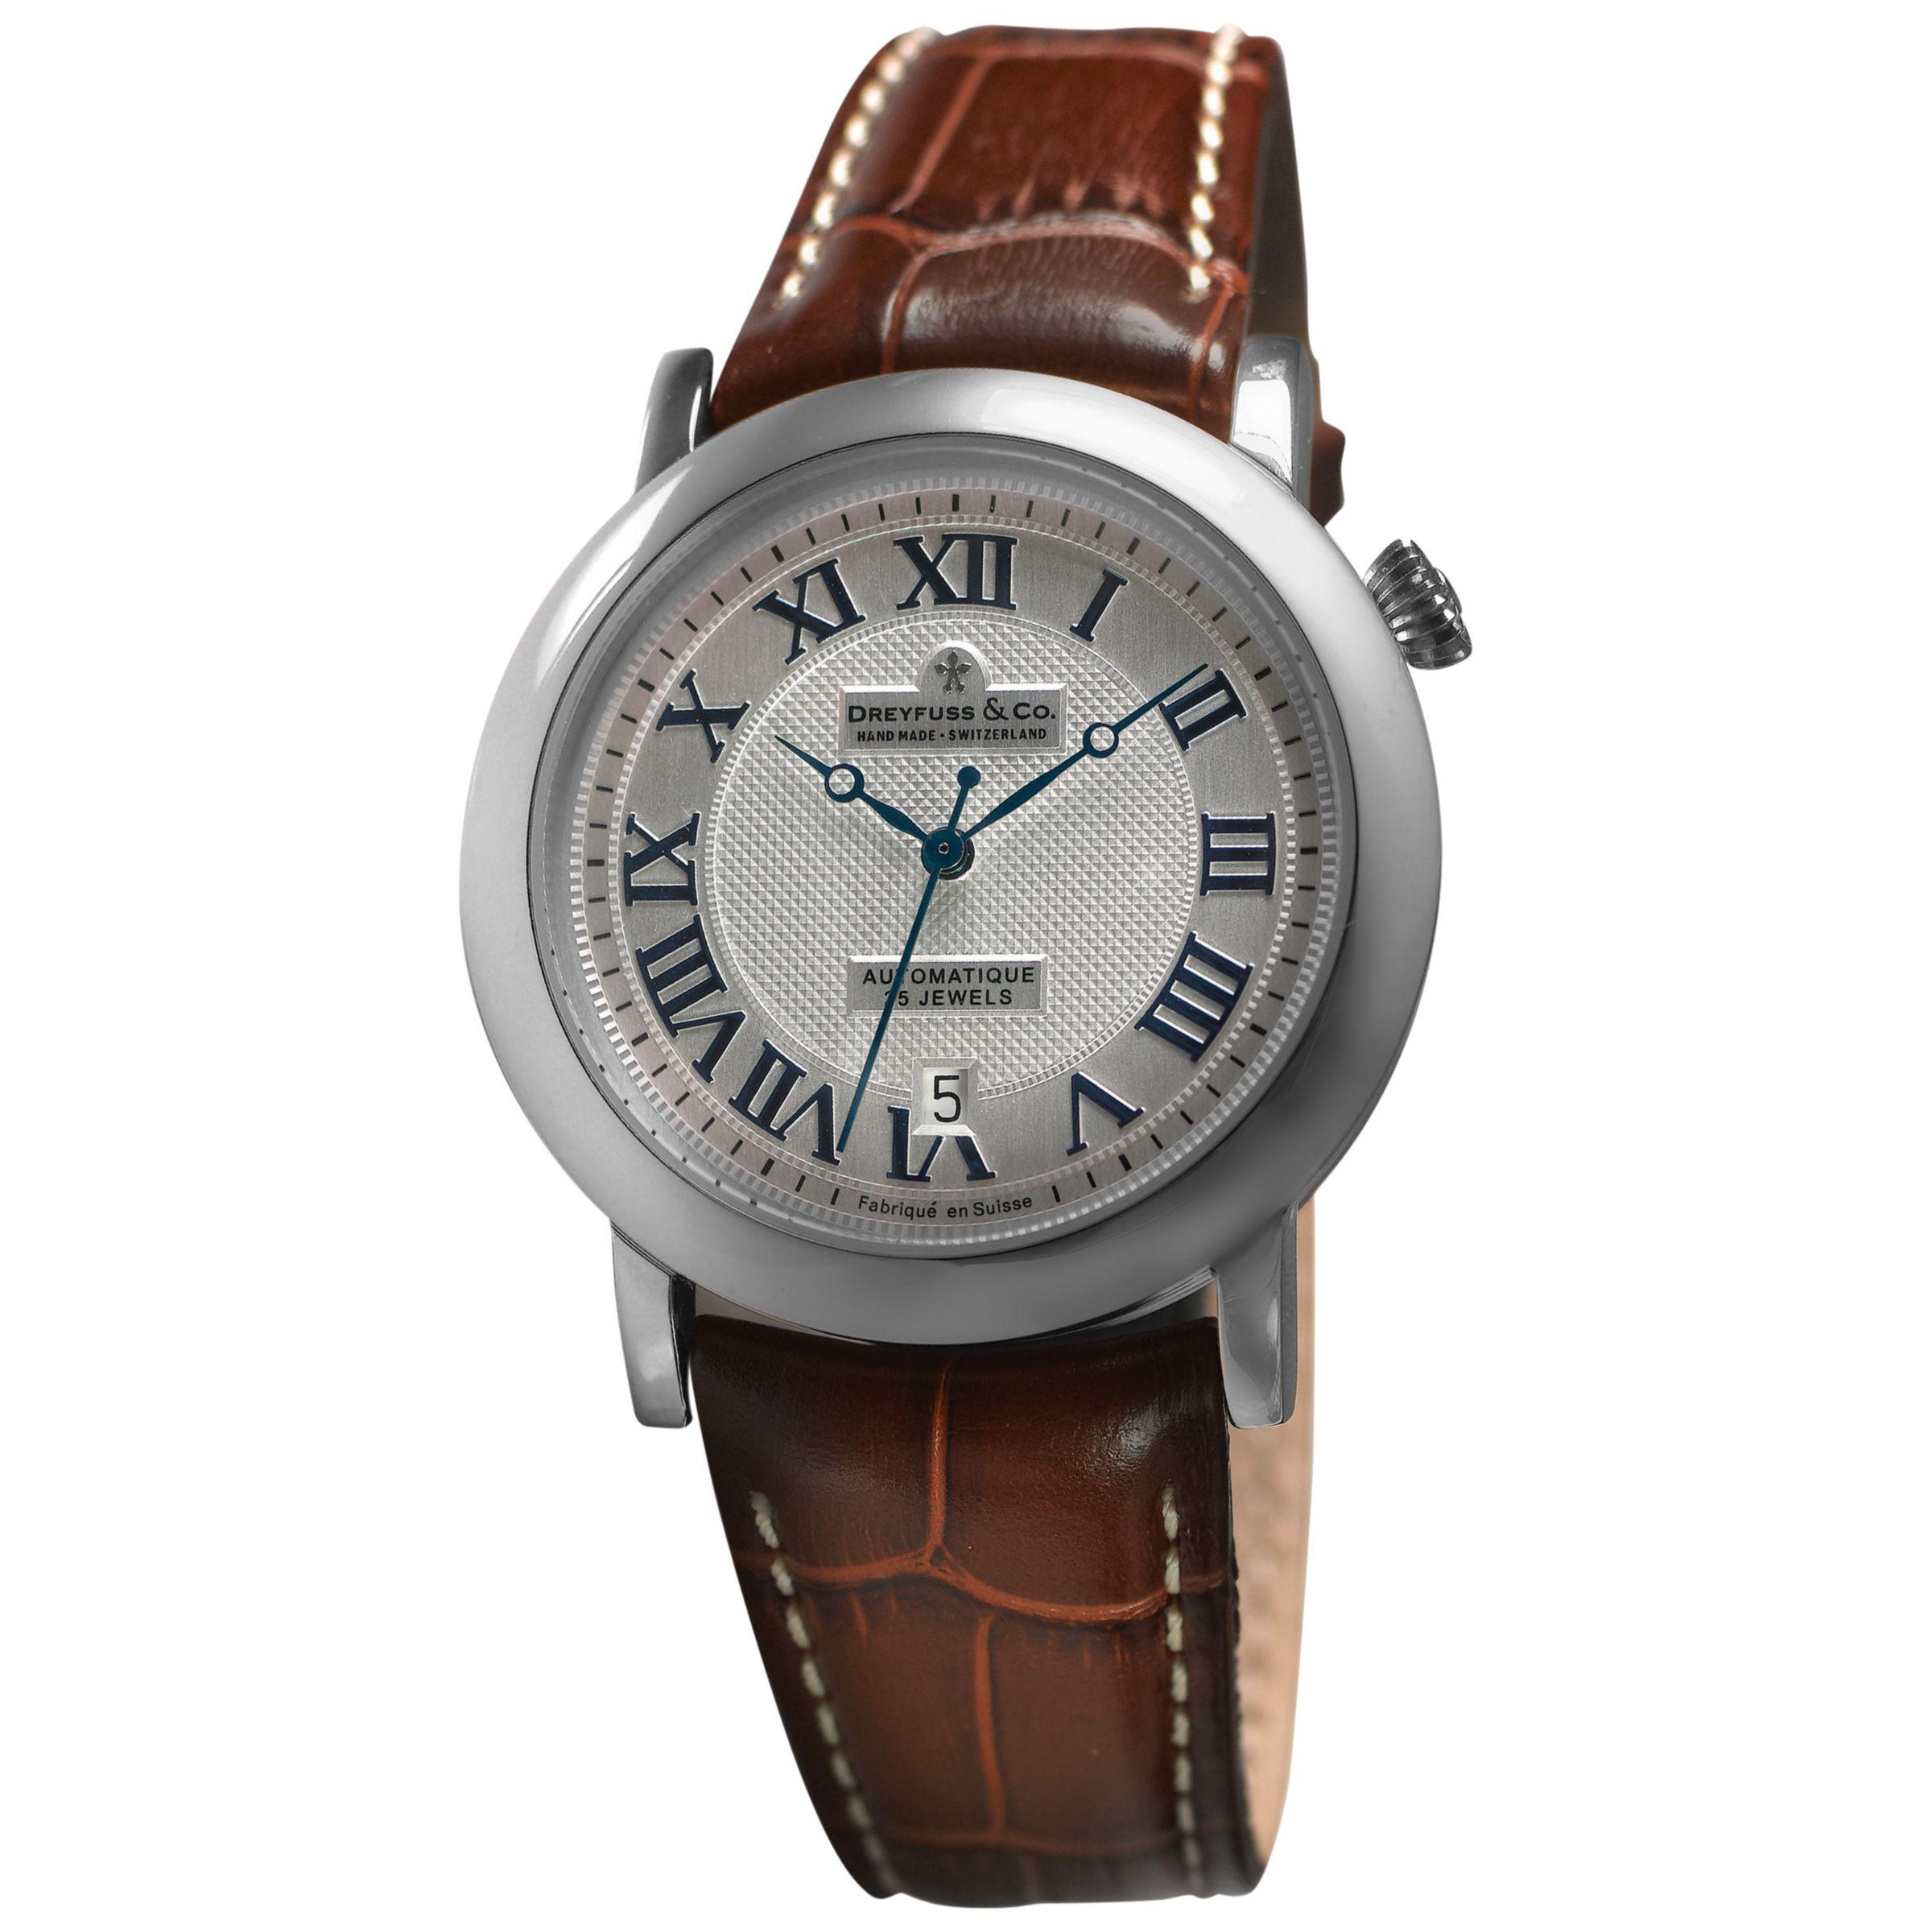 Dreyfuss & Co Dreyfuss & Co DGS00030/21 Men's 1925 Leather Strap Watch, Brown/Silver